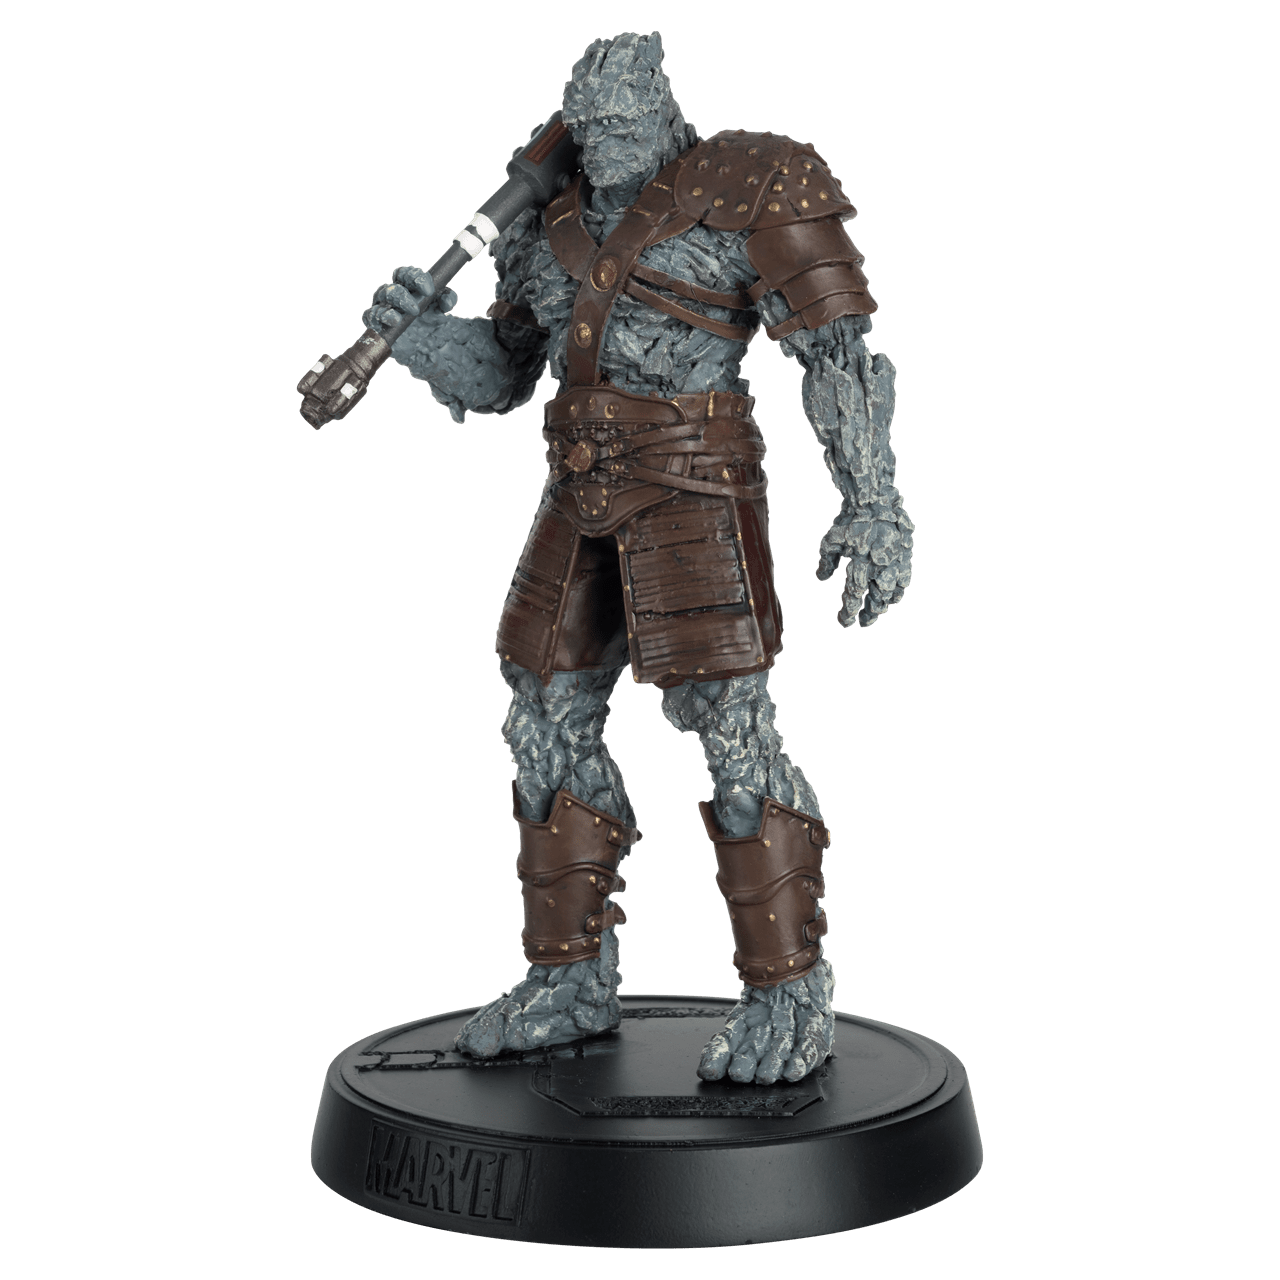 Korg (Special): Marvel Figurine: Hero Collector - 2